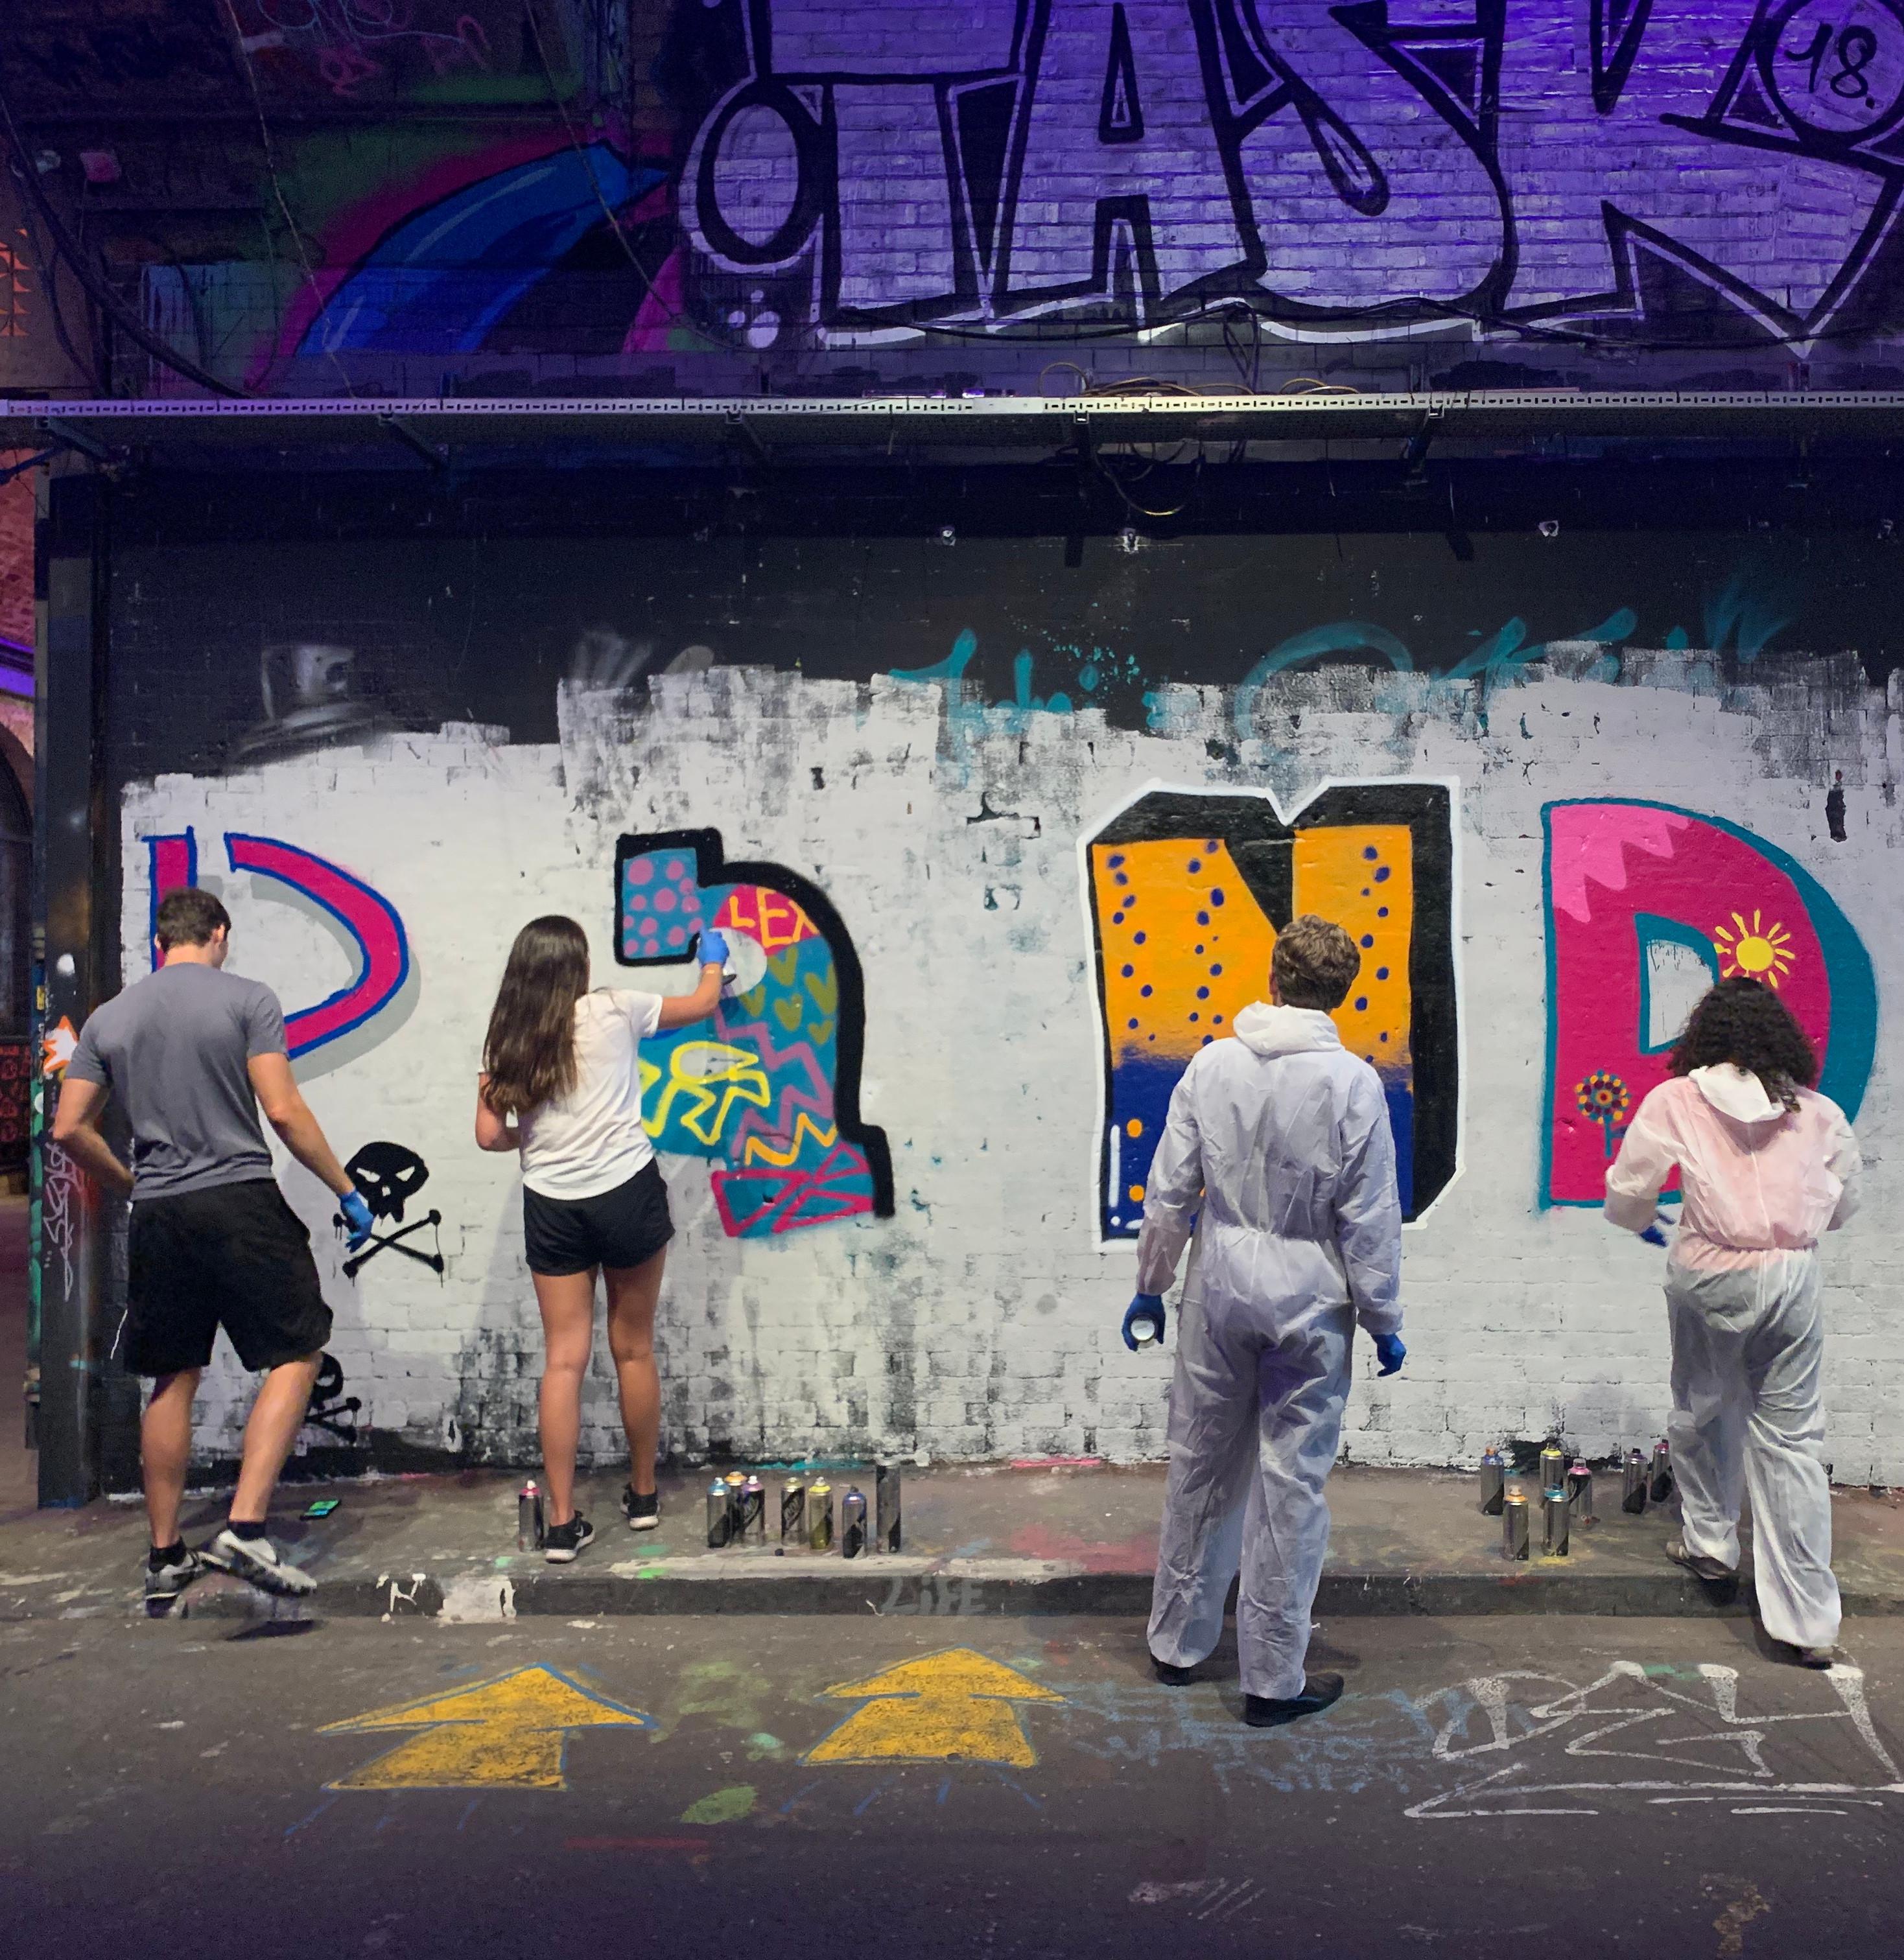 Graffiti workshop 3 - 4 people